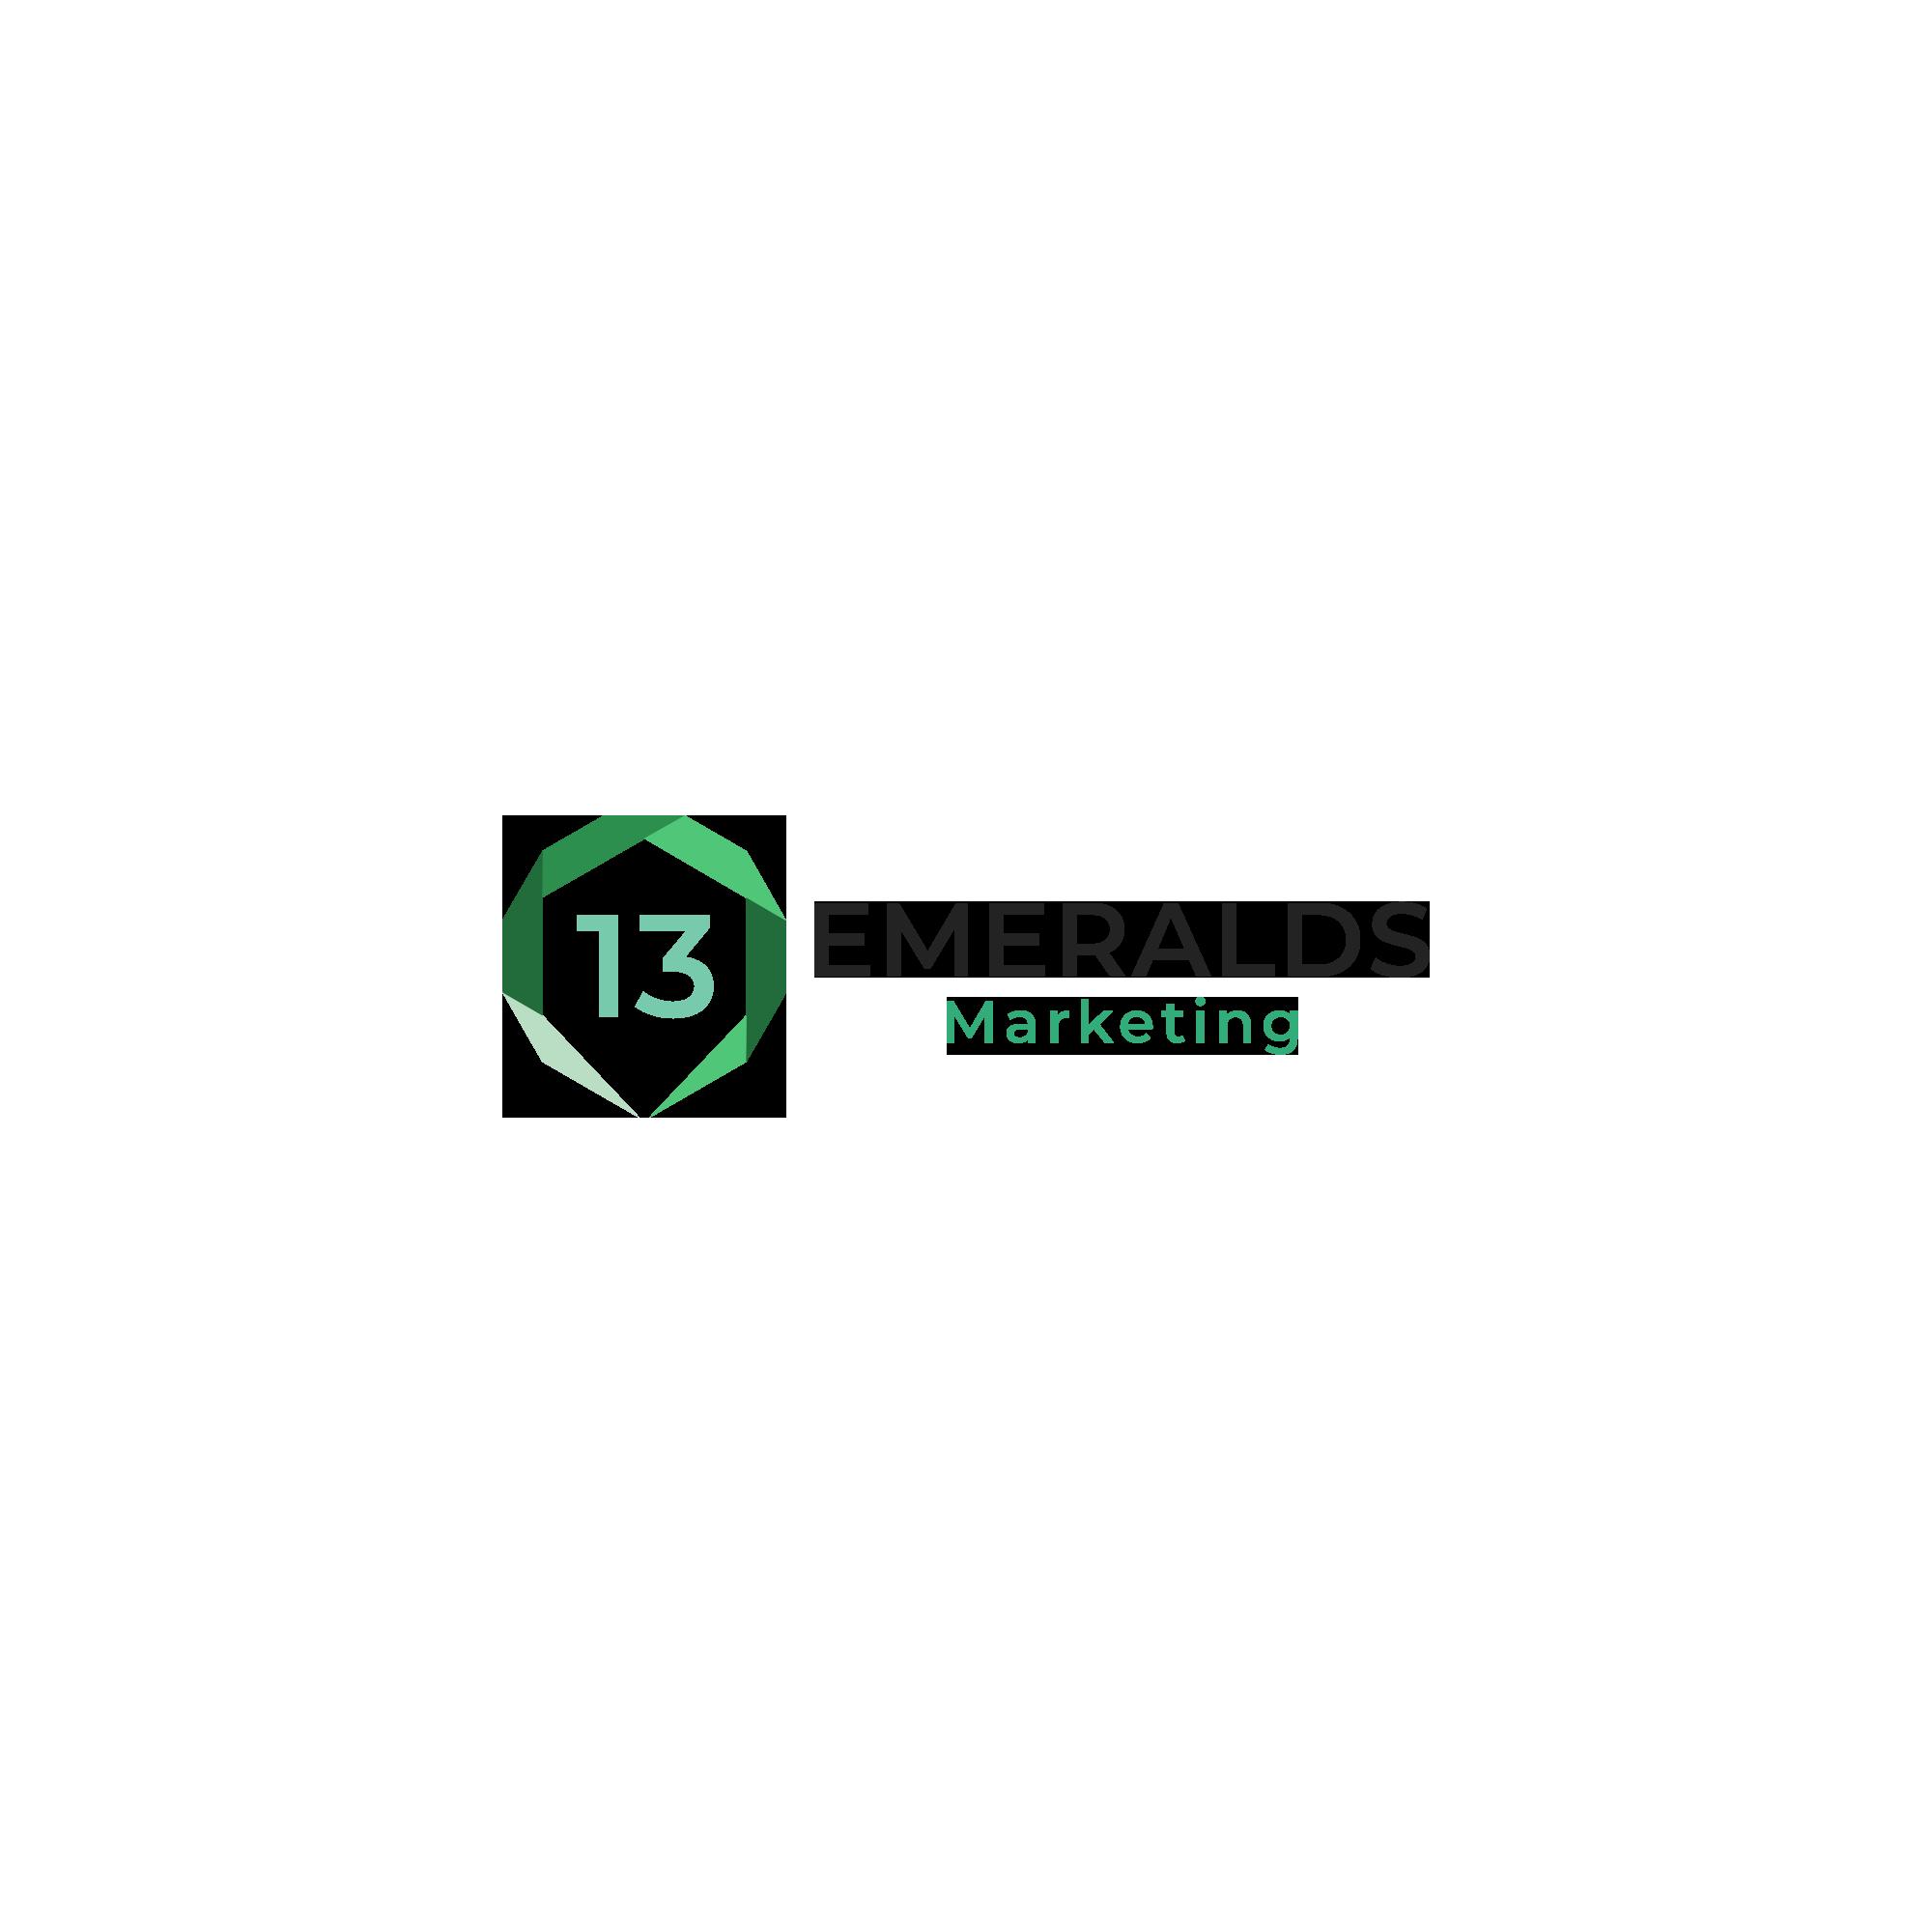 13 Emeralds Marketing, LLC